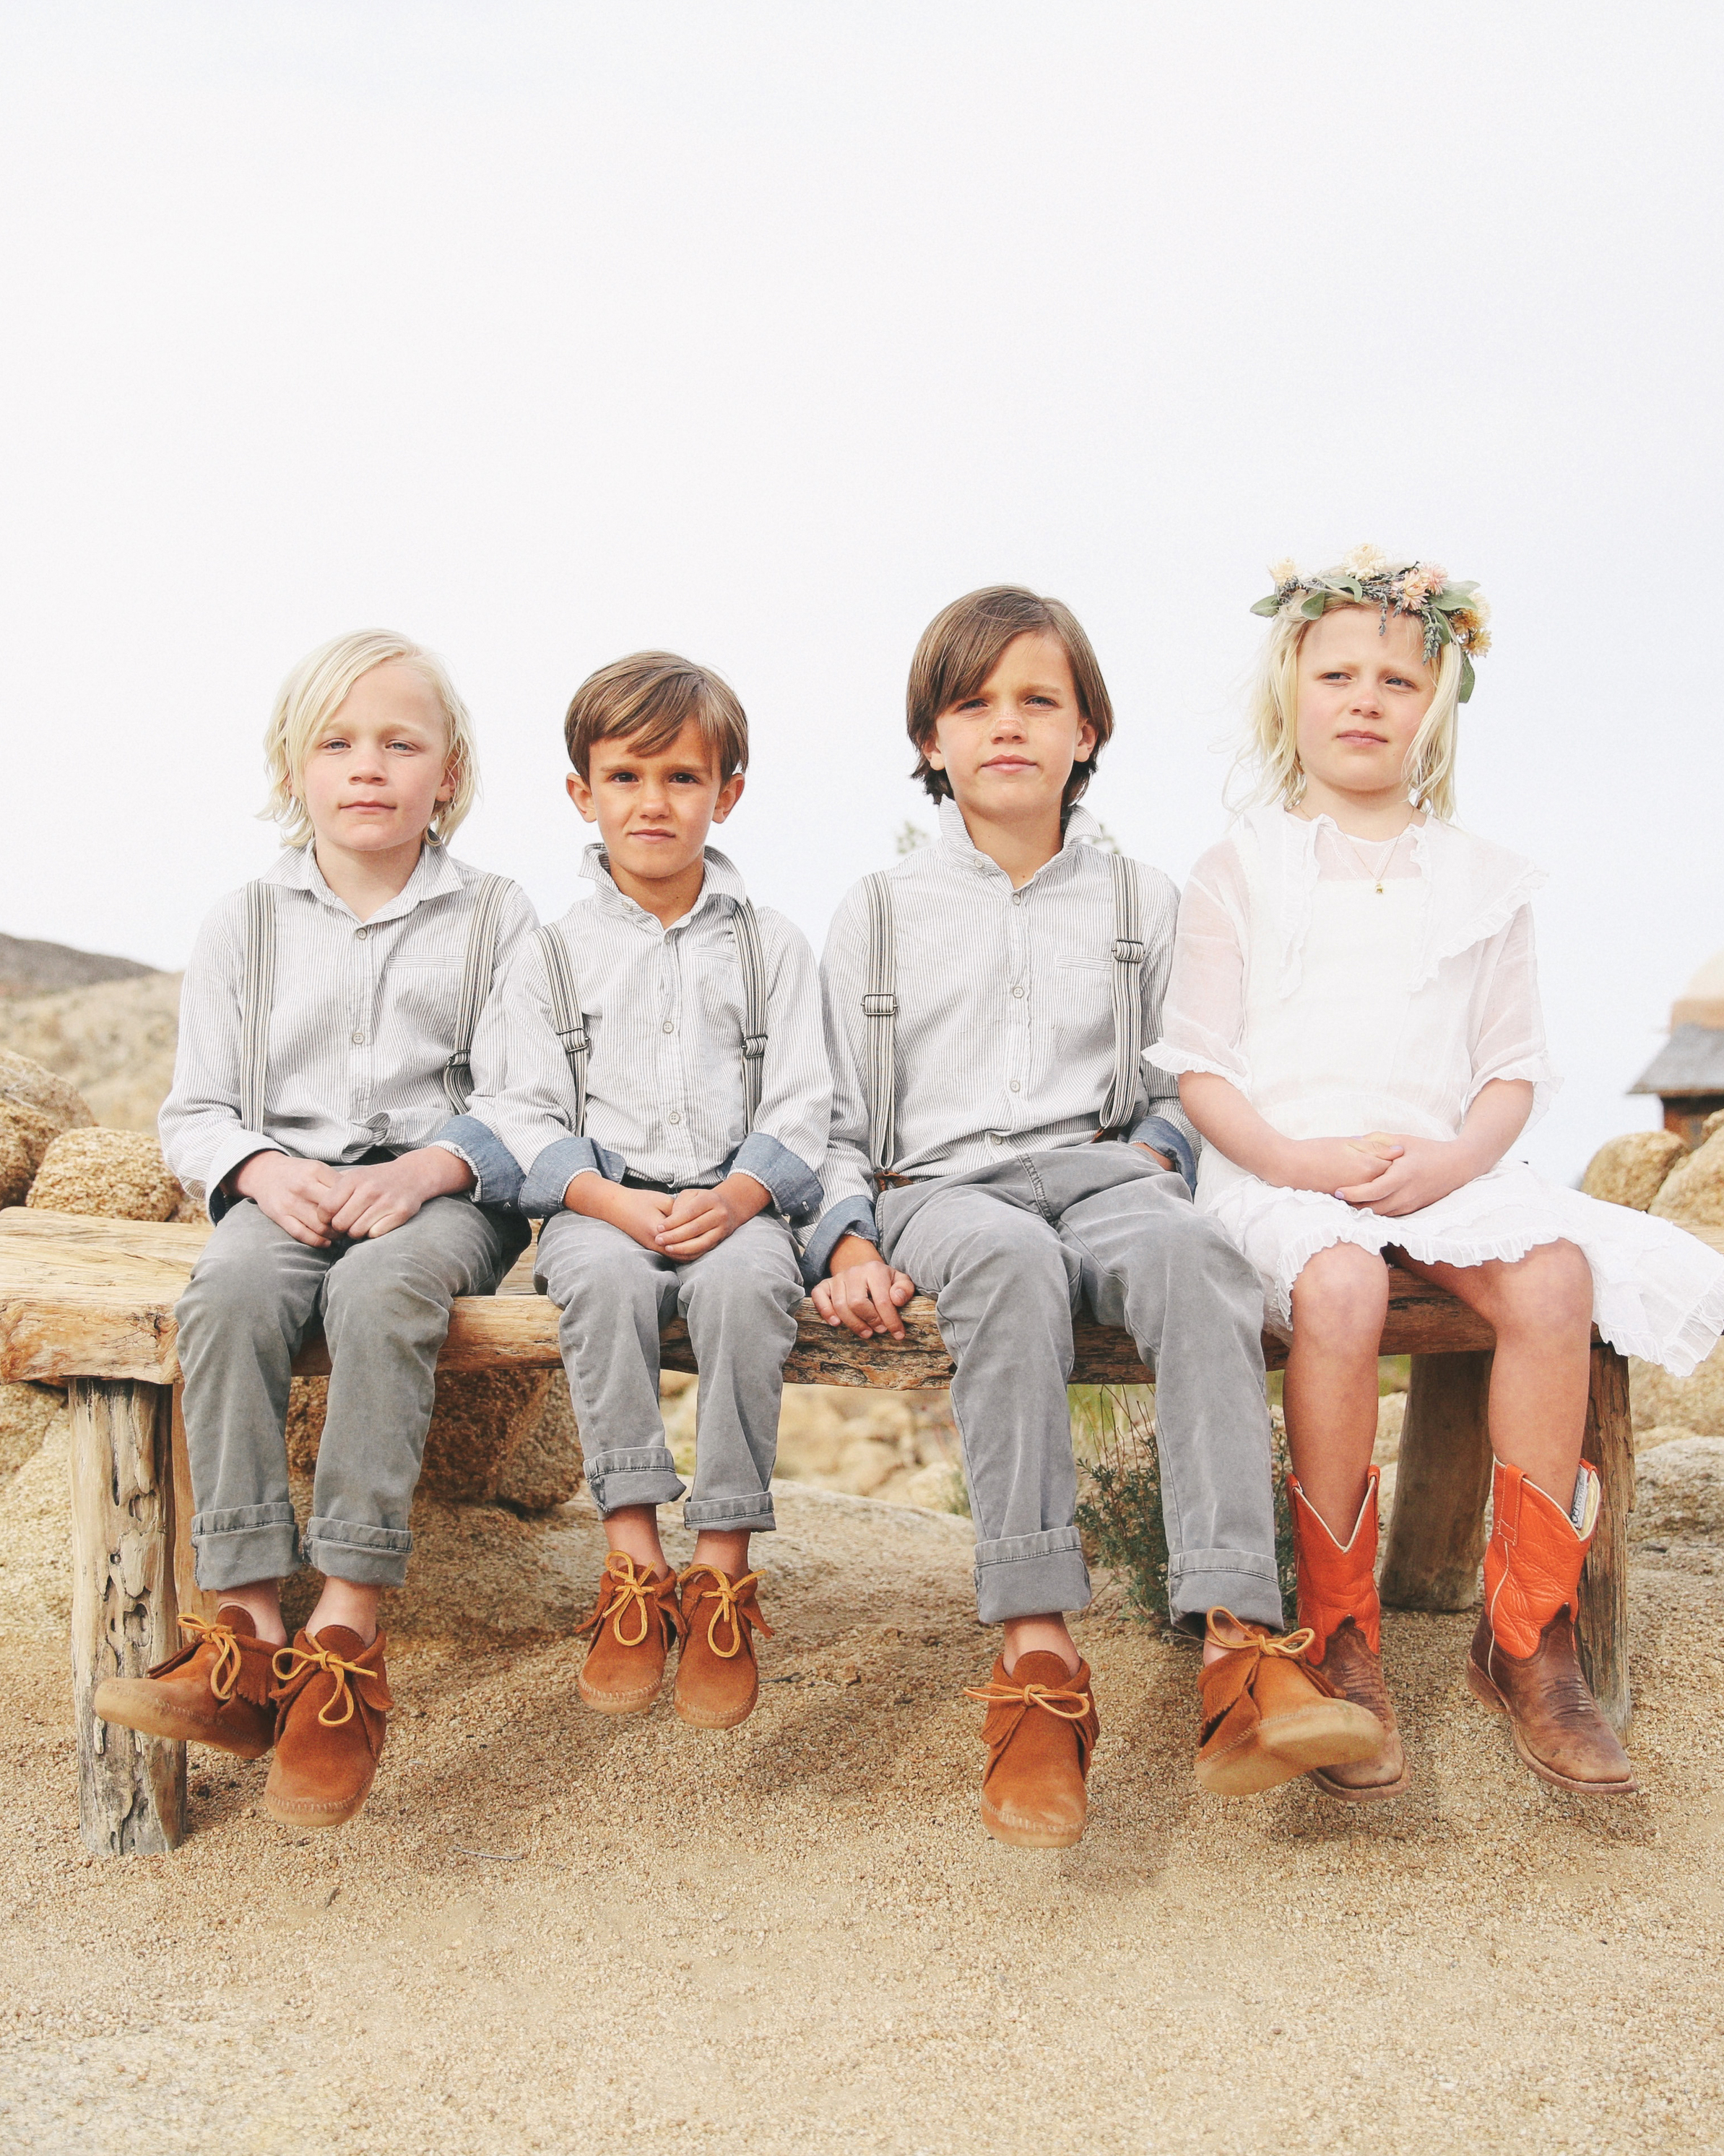 christen-billy-wedding-kids-147-011-s111597-1014.jpg